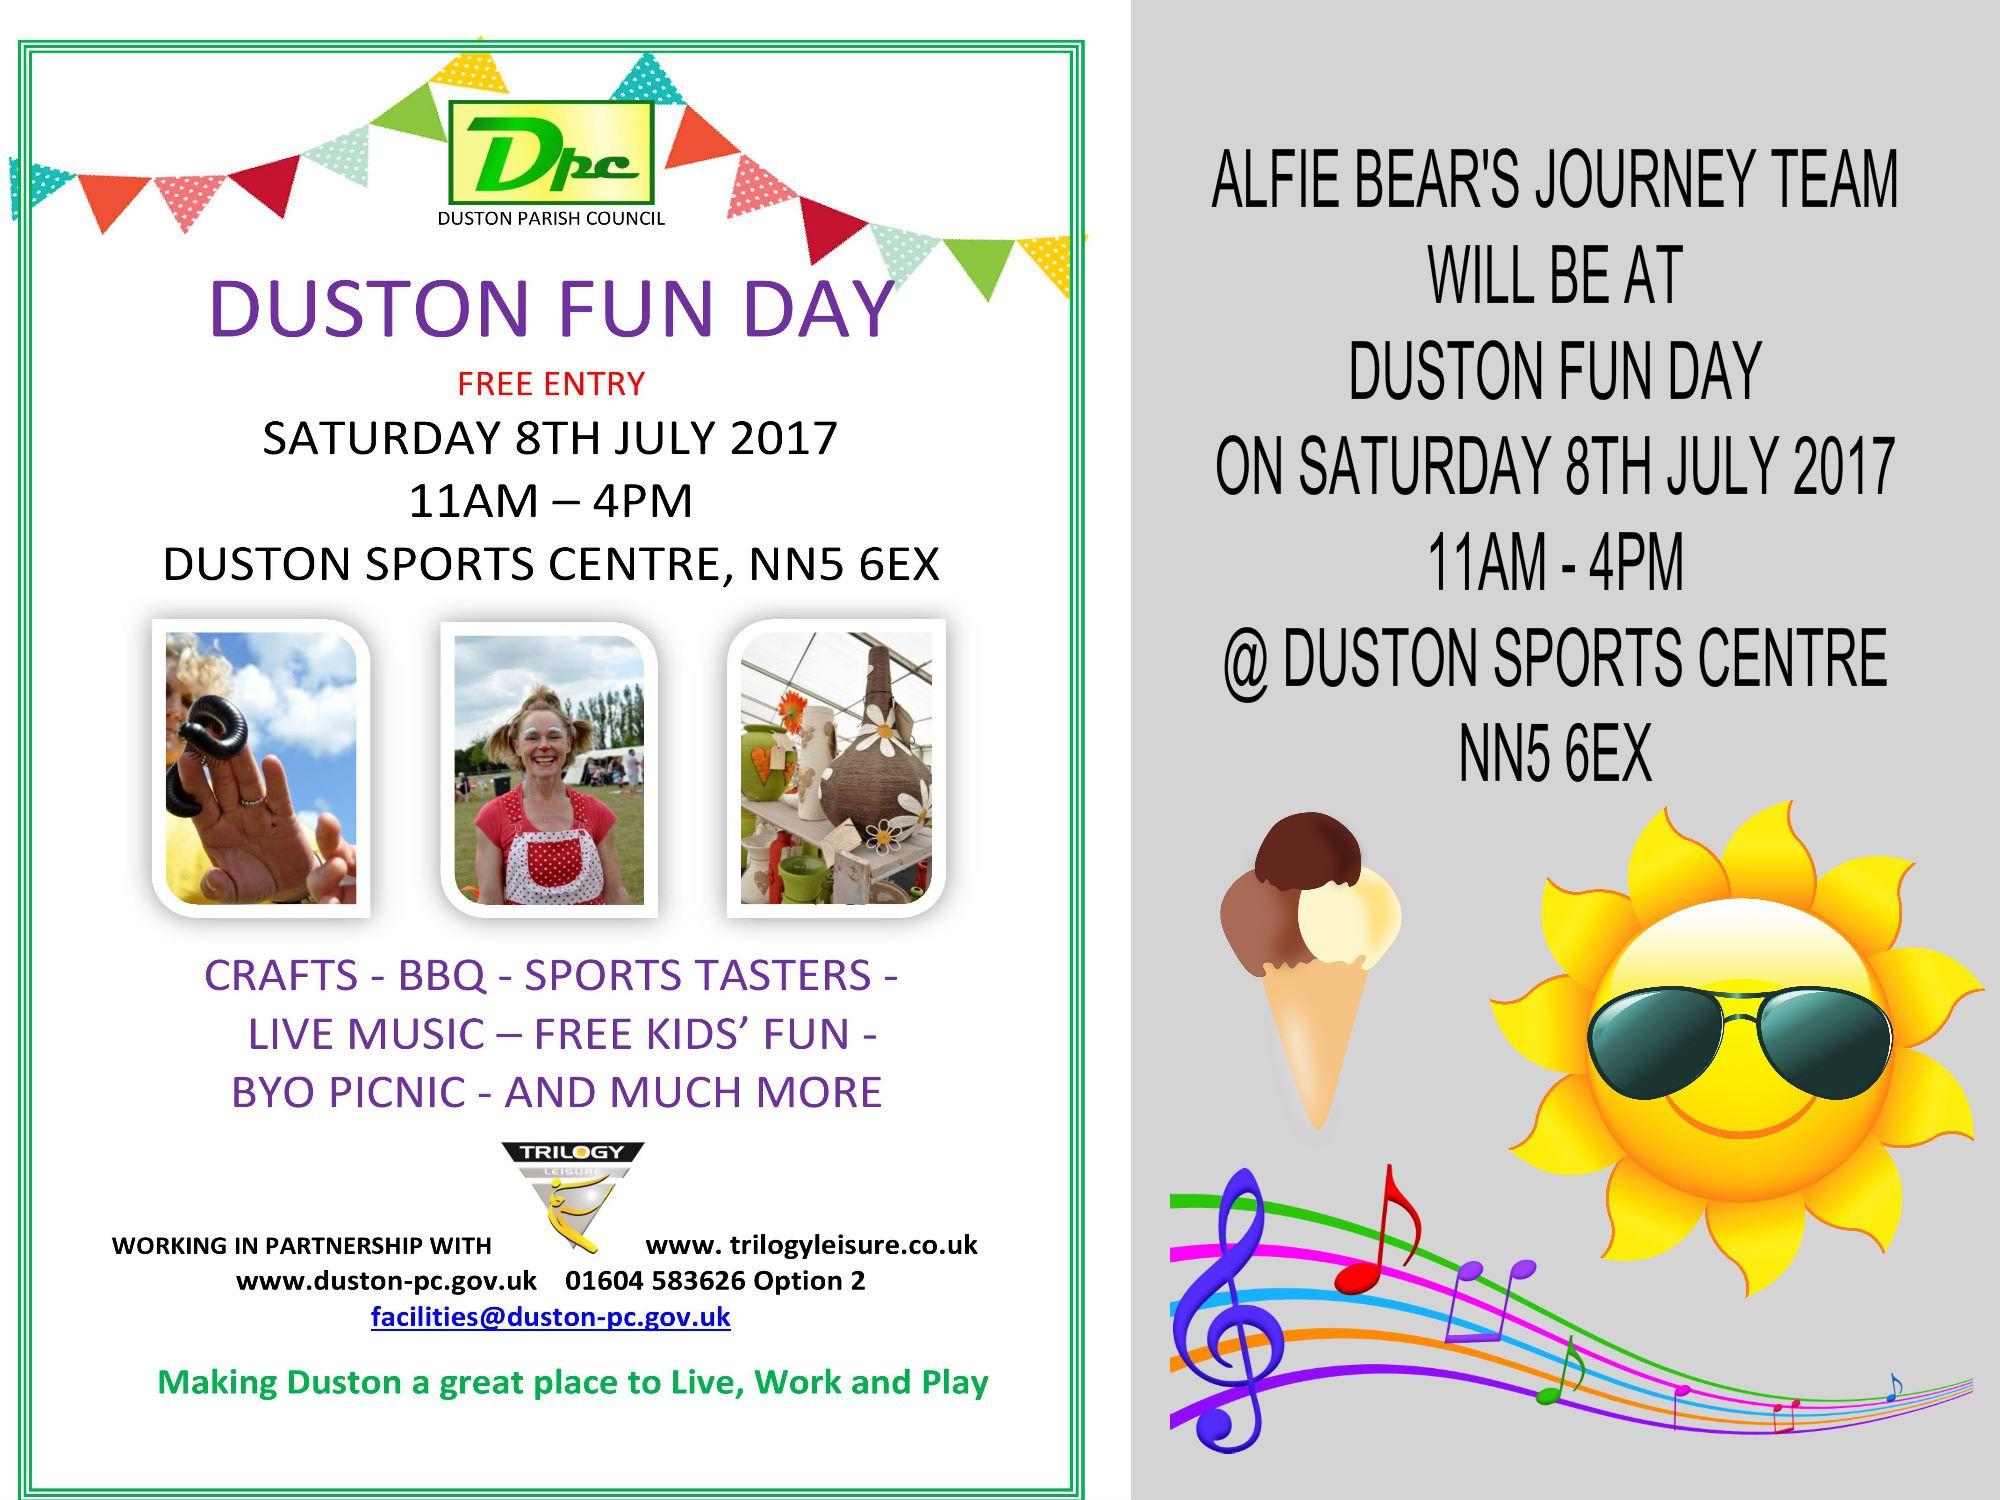 Duston Fun Day 2017